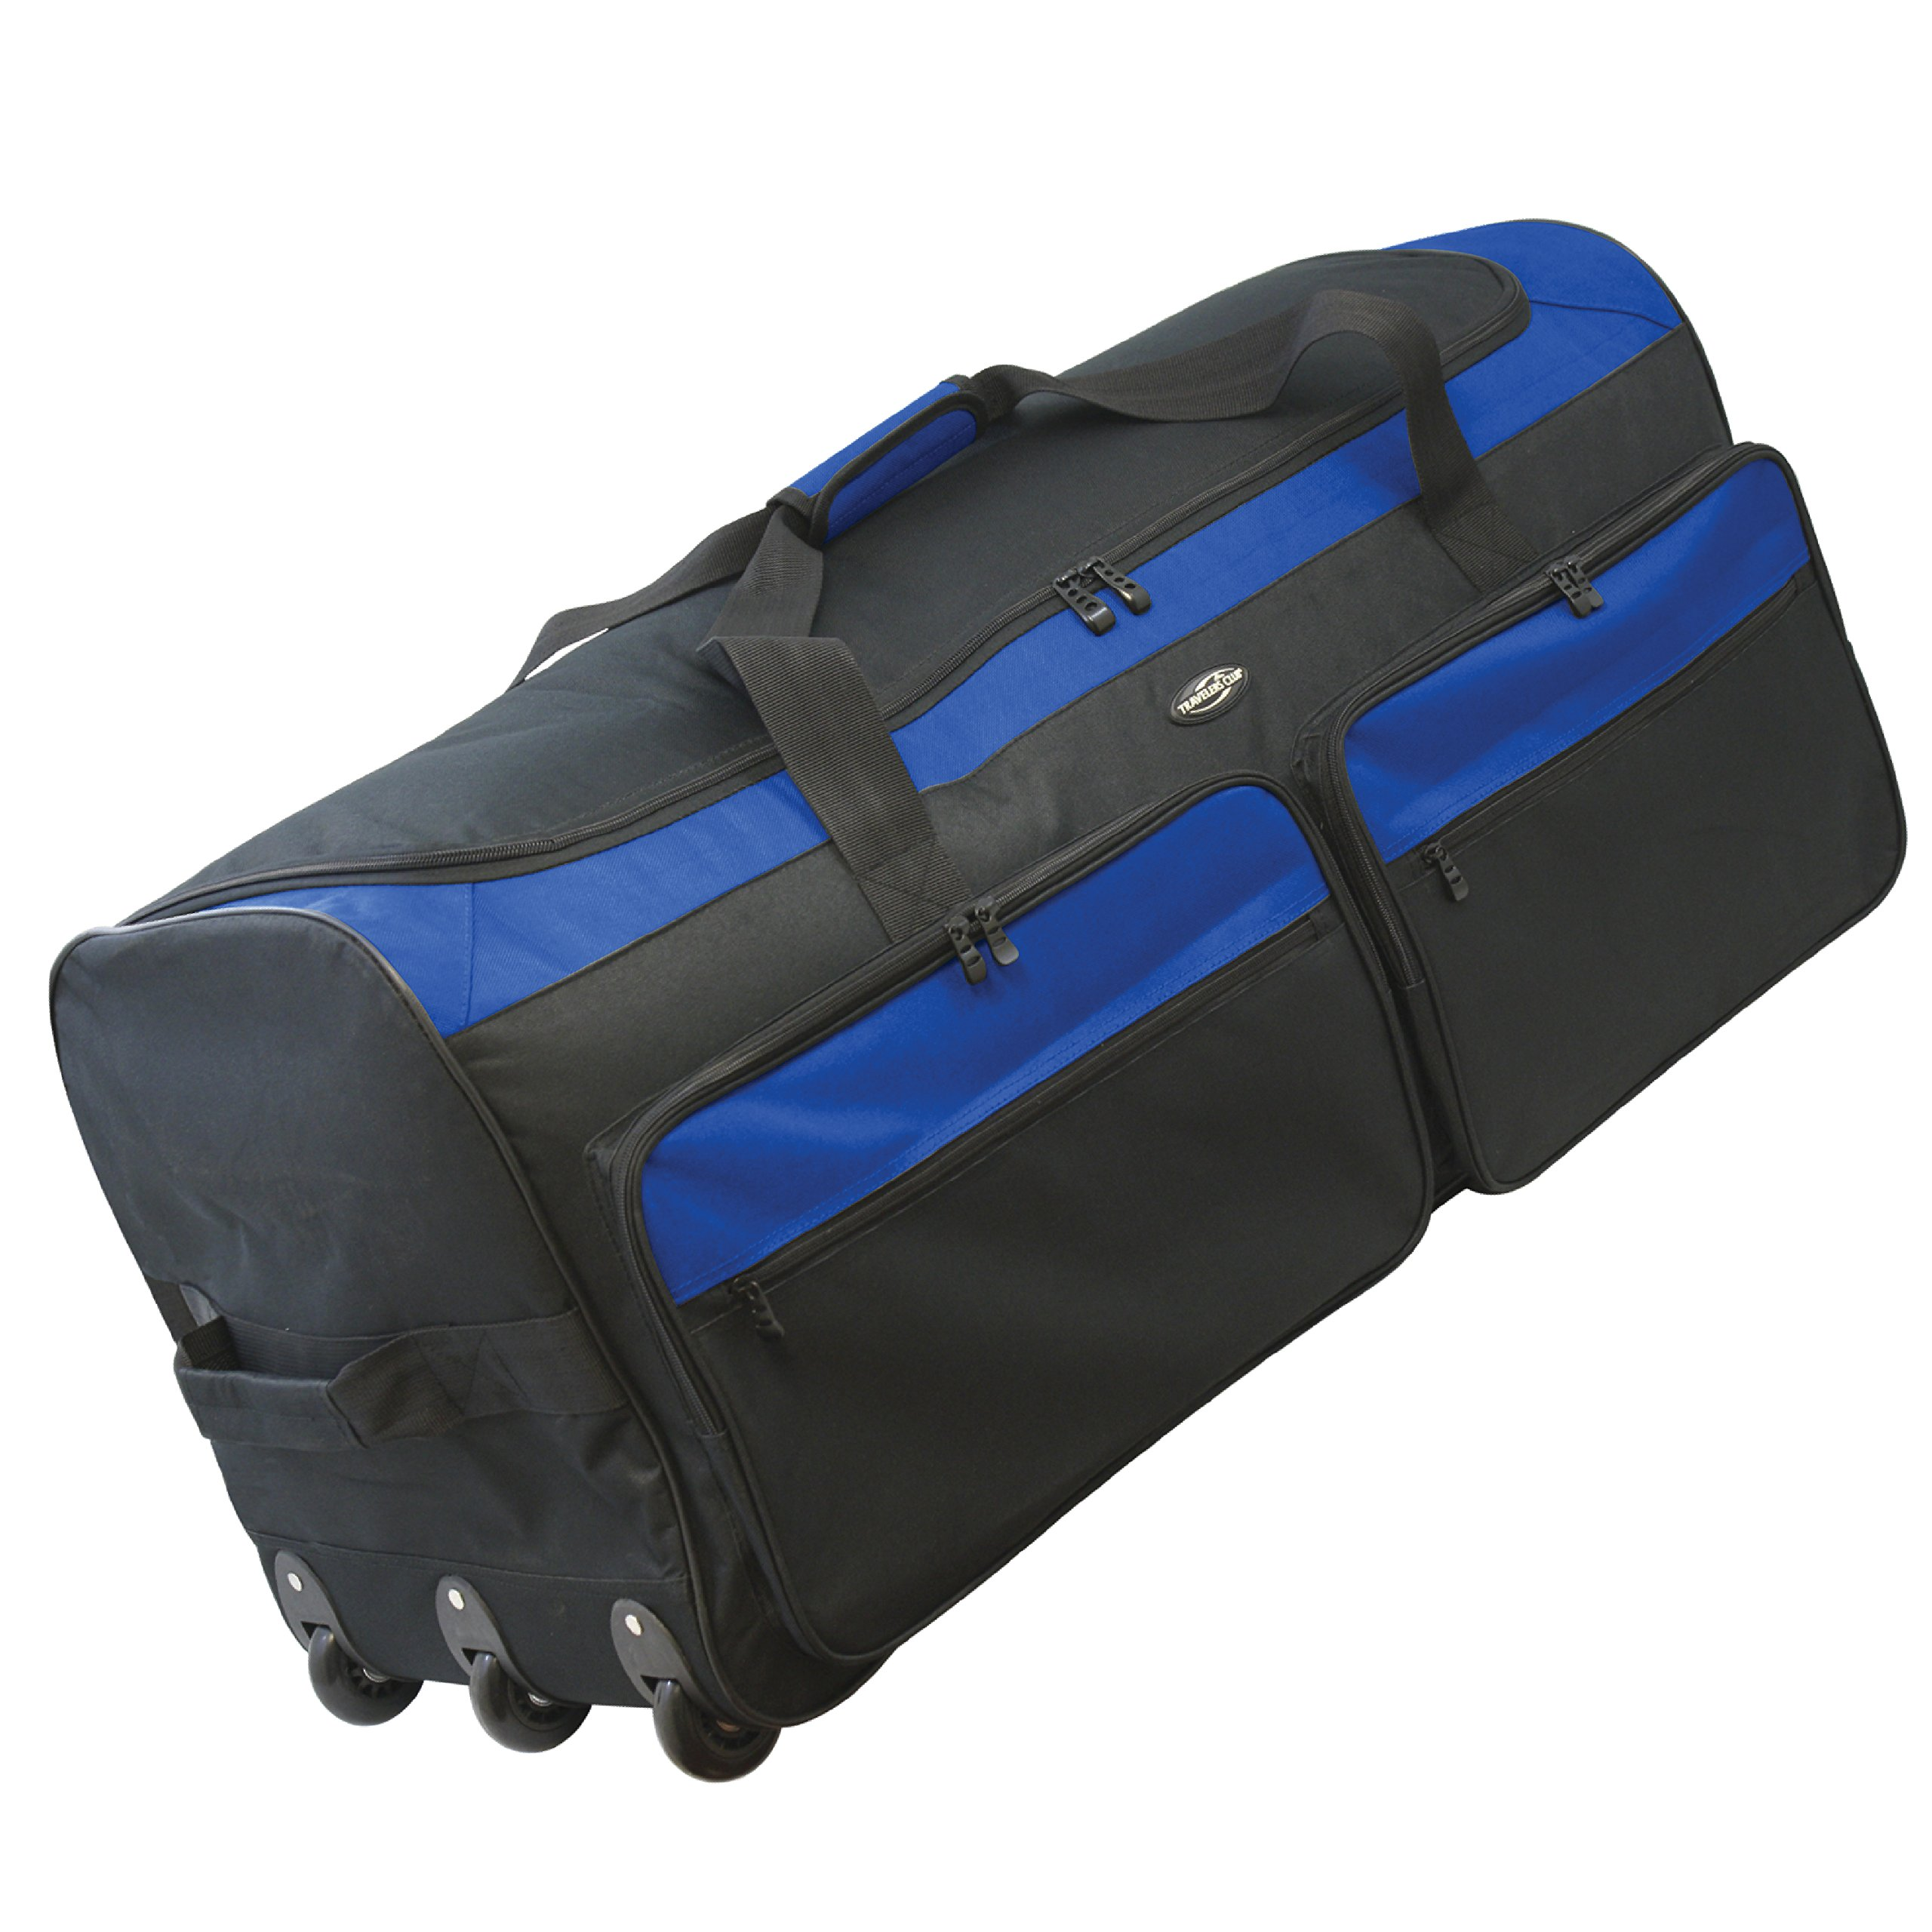 Travelers Club 36'' X-Large Expandable Triple Wheeled Rolling Duffel Luggage